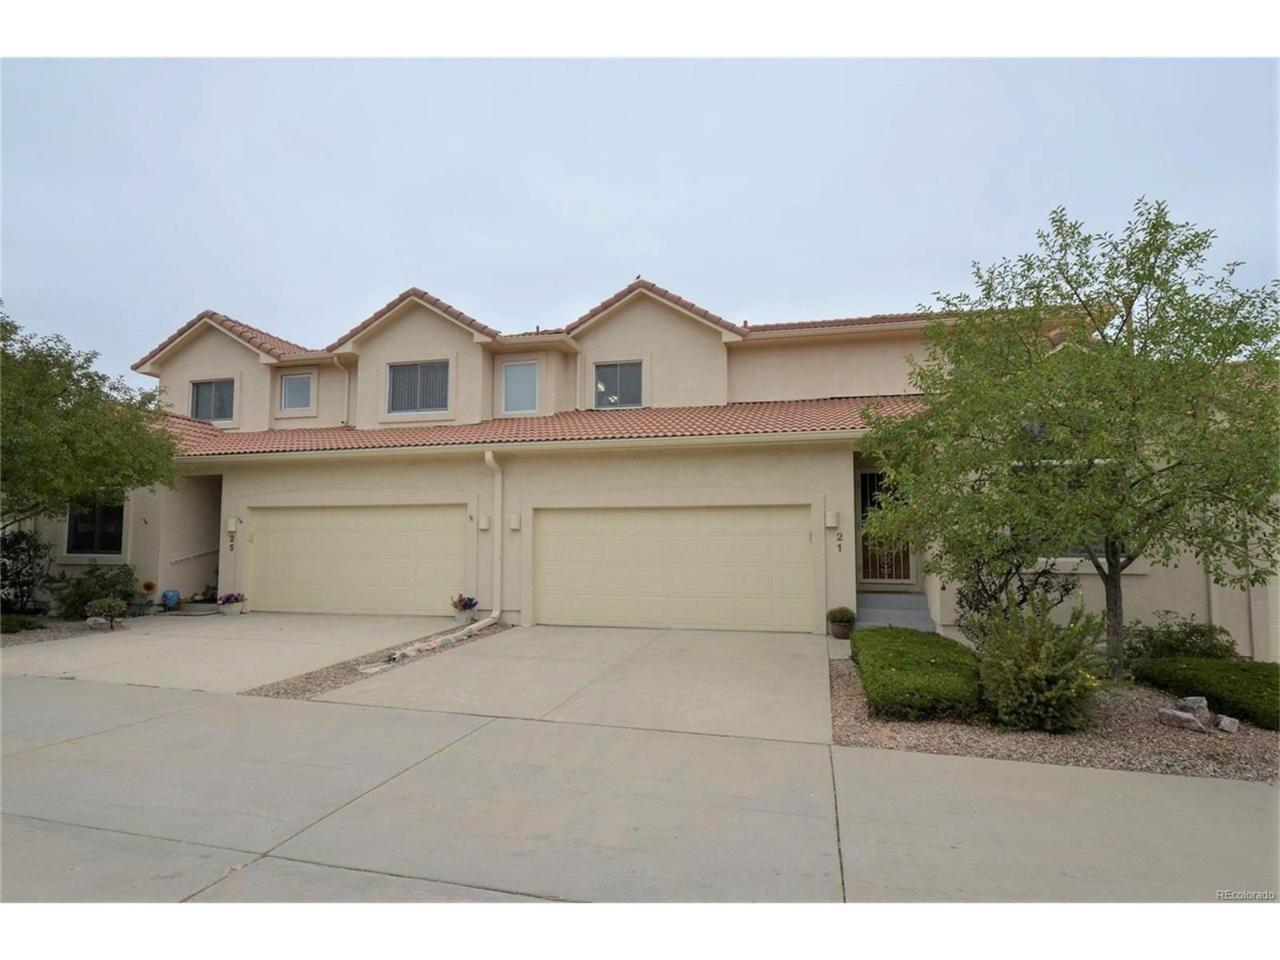 21 Luxury Lane, Colorado Springs, CO 80921 (MLS #8306130) :: 8z Real Estate